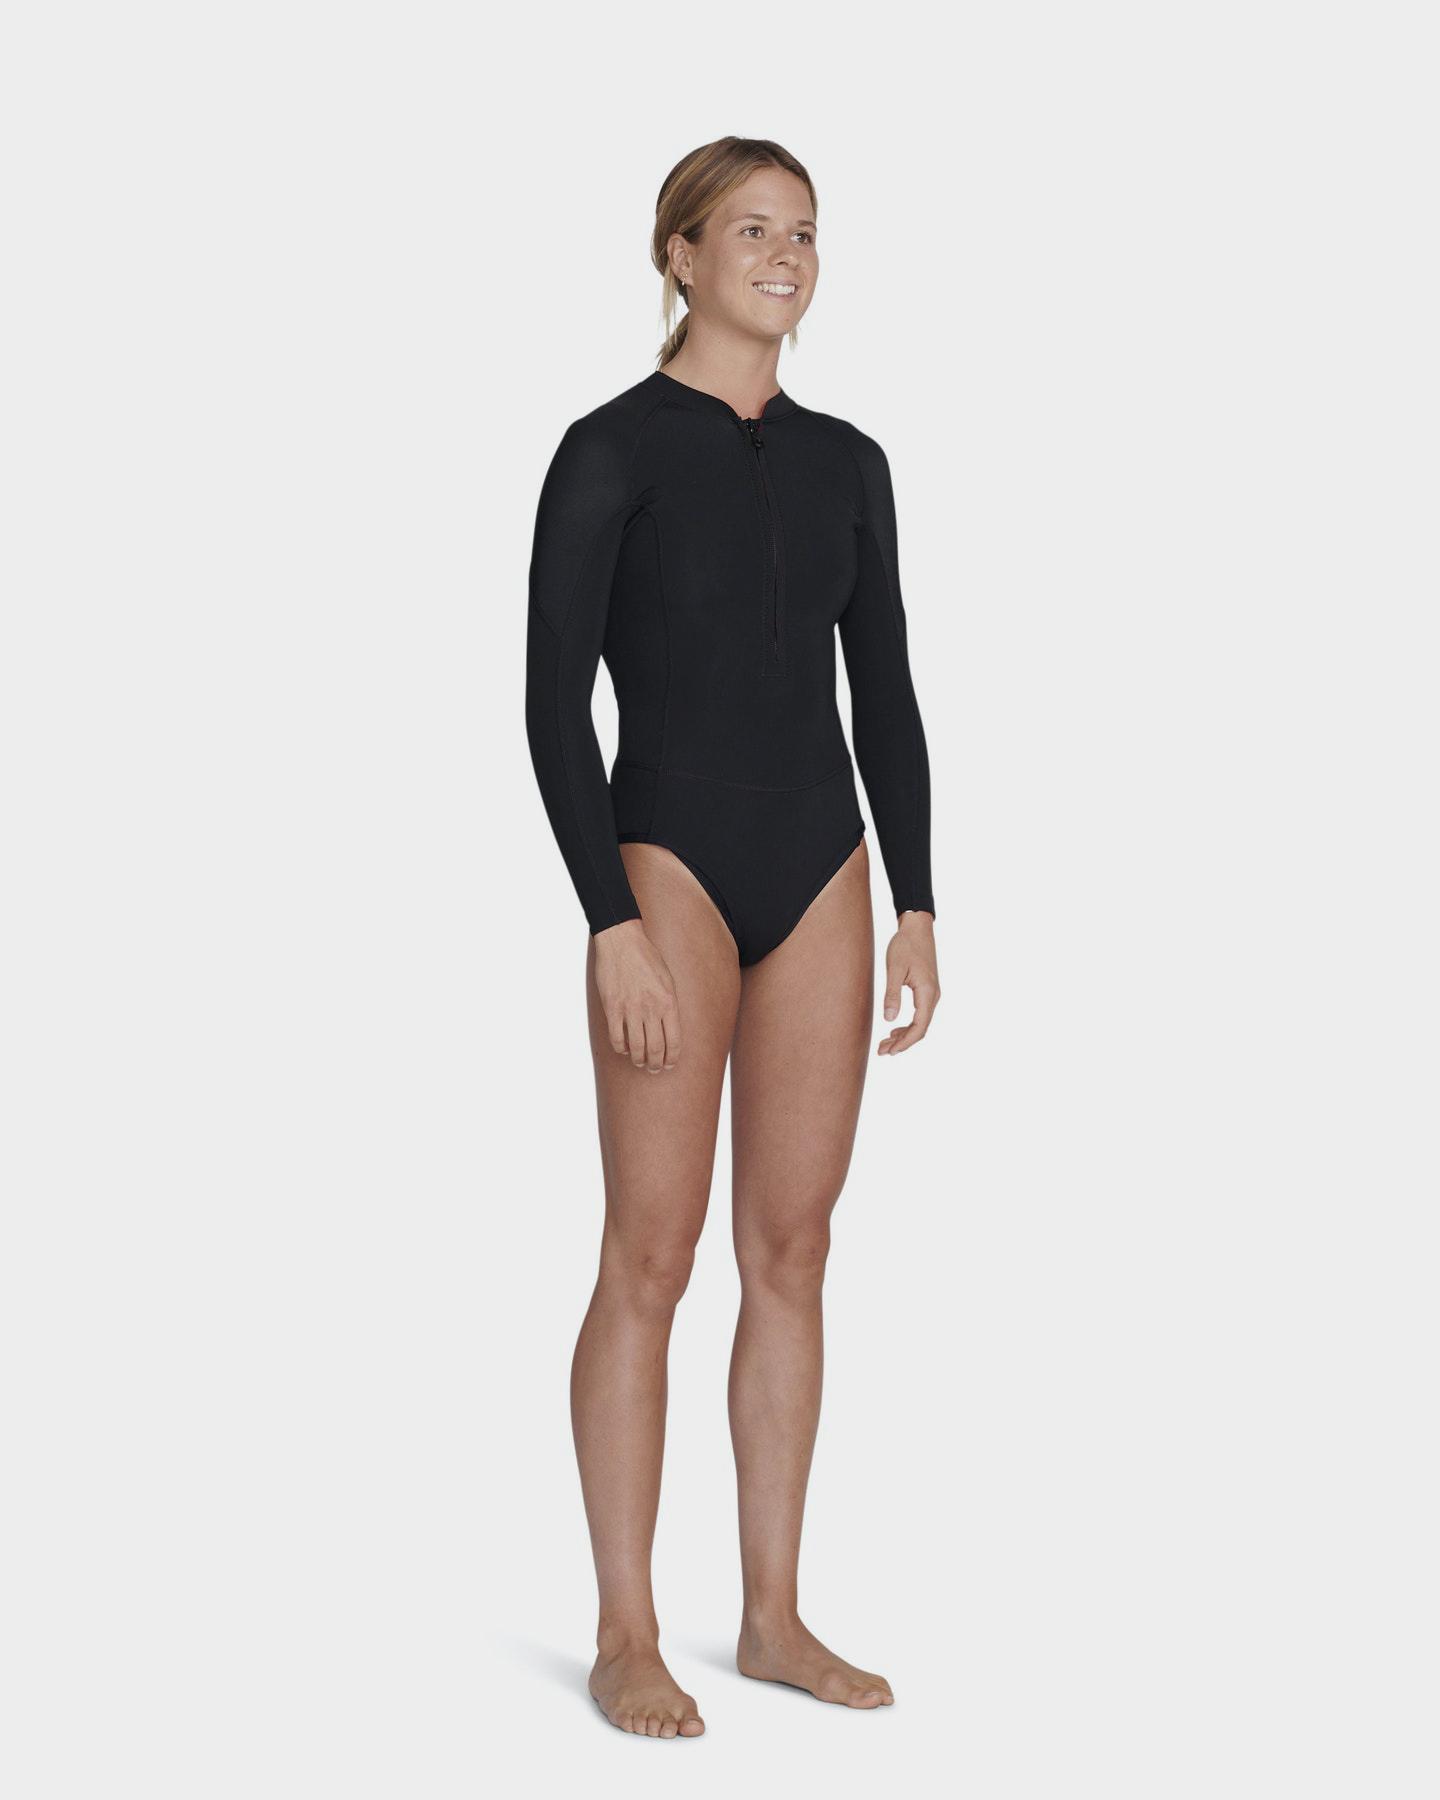 Project Blank Womens 2Mm High Performance Ls Springsuit Bikini Cut Black